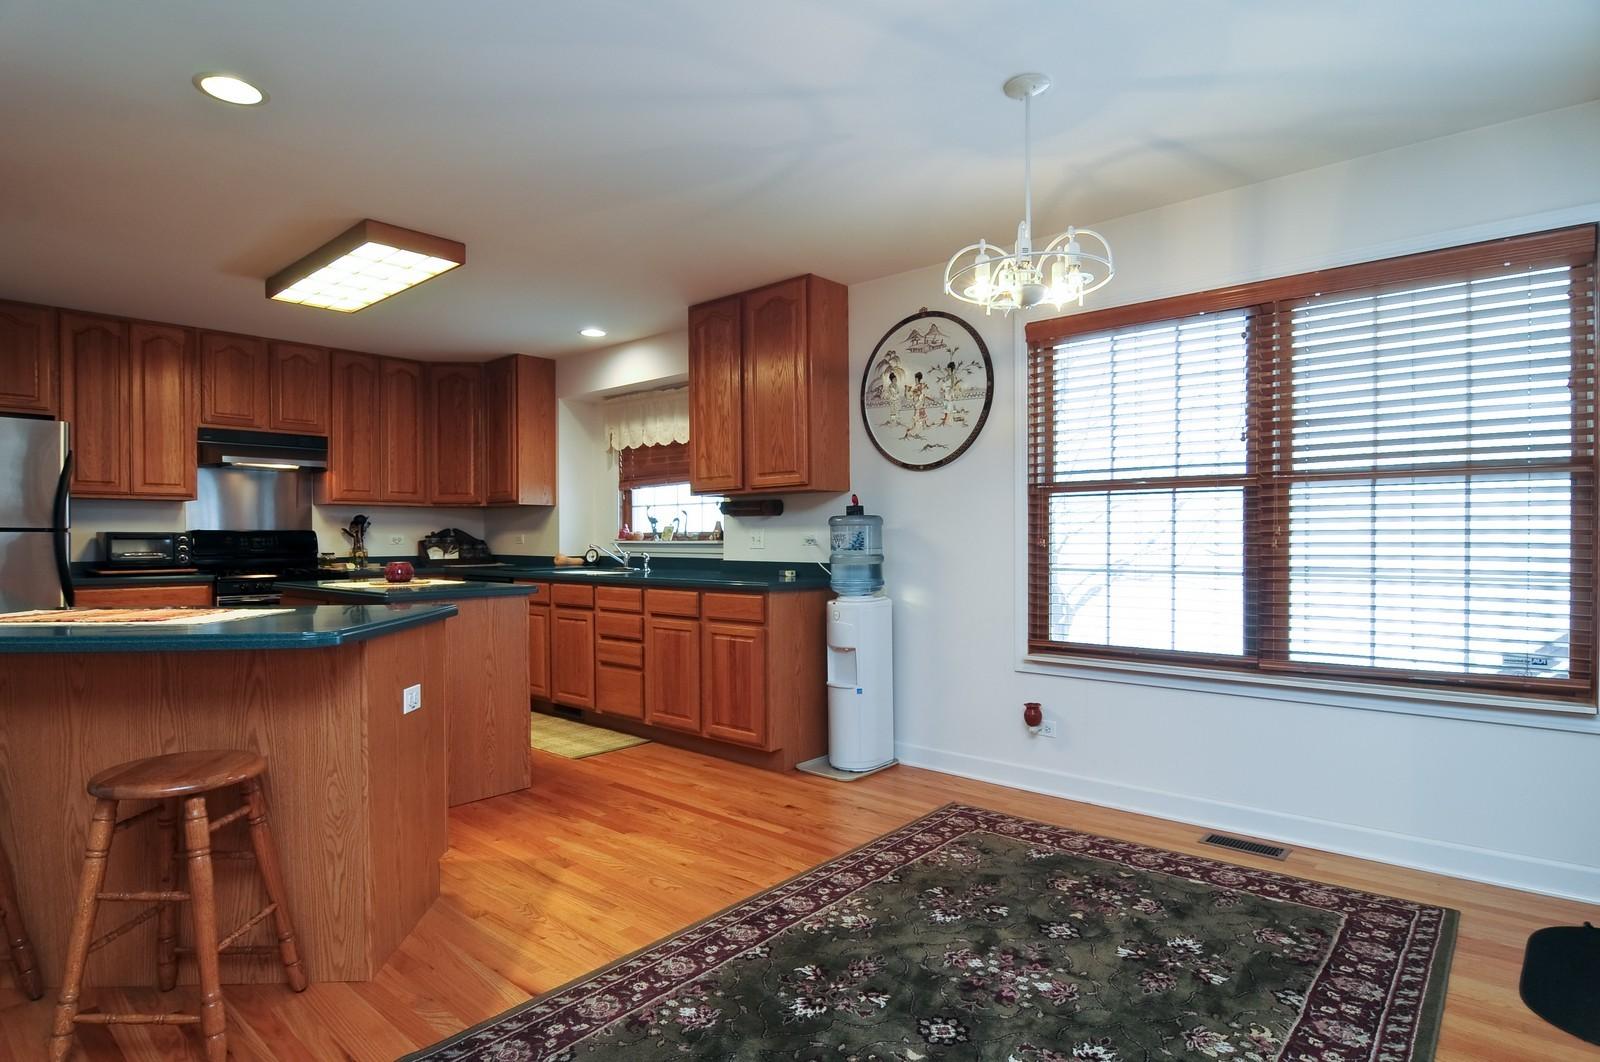 Real Estate Photography - 35100 N Shoreline Dr, Ingleside, IL, 60041 - Kitchen / Breakfast Room